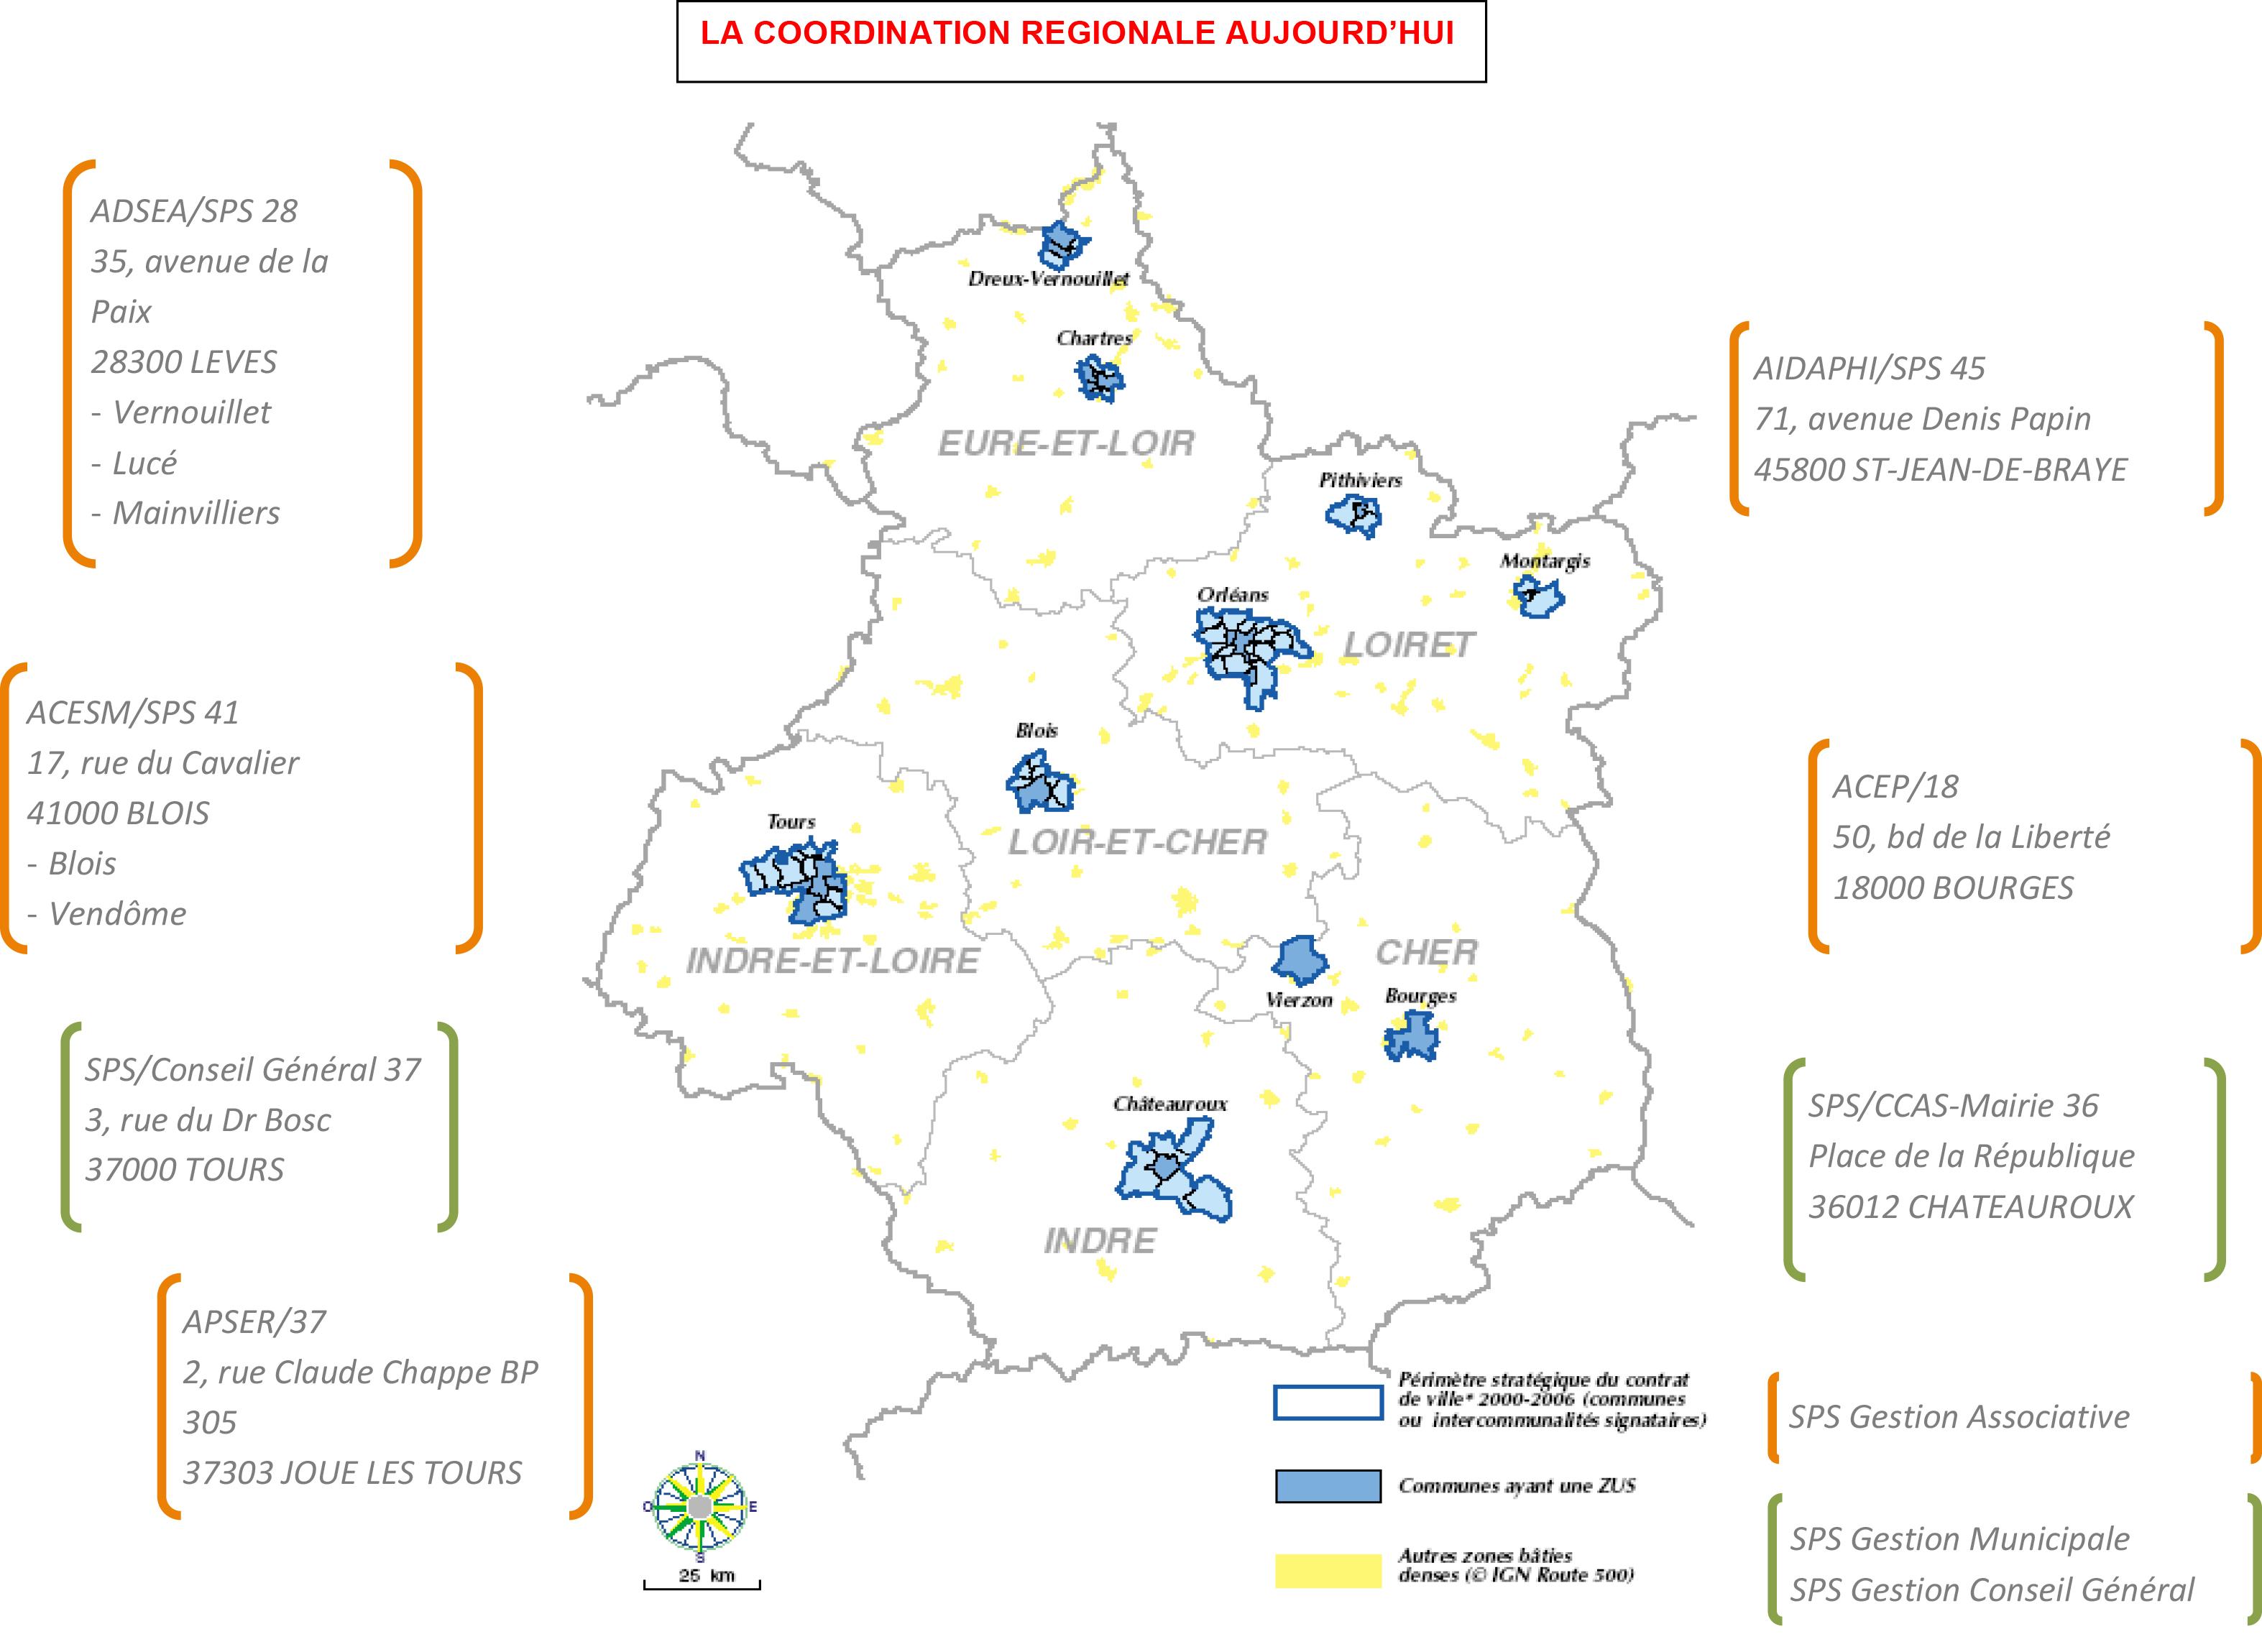 coordination_regionale_aujourdhui